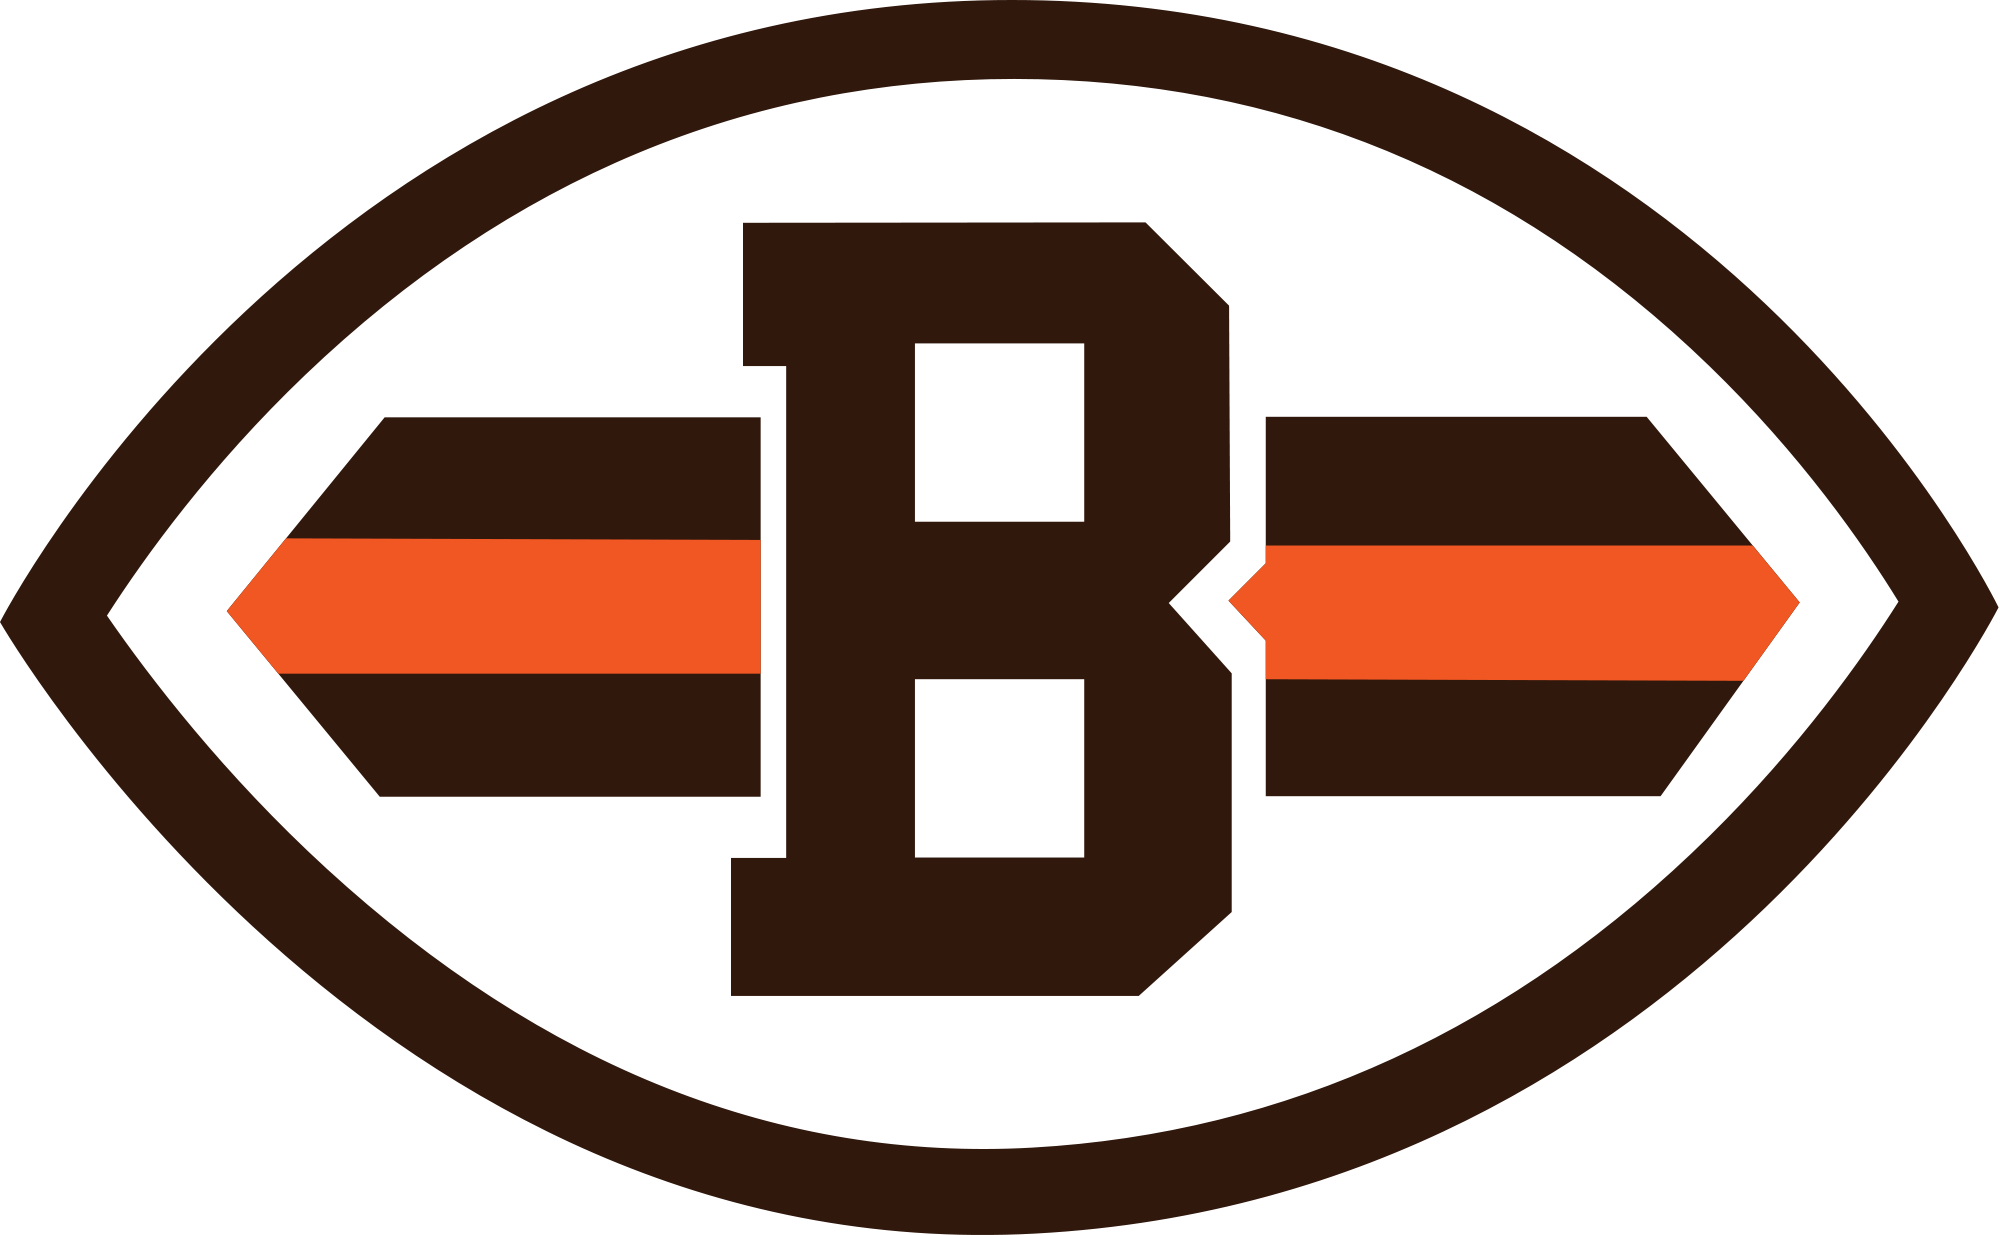 Open PlusPng.com  - Cleveland Browns Logo PNG